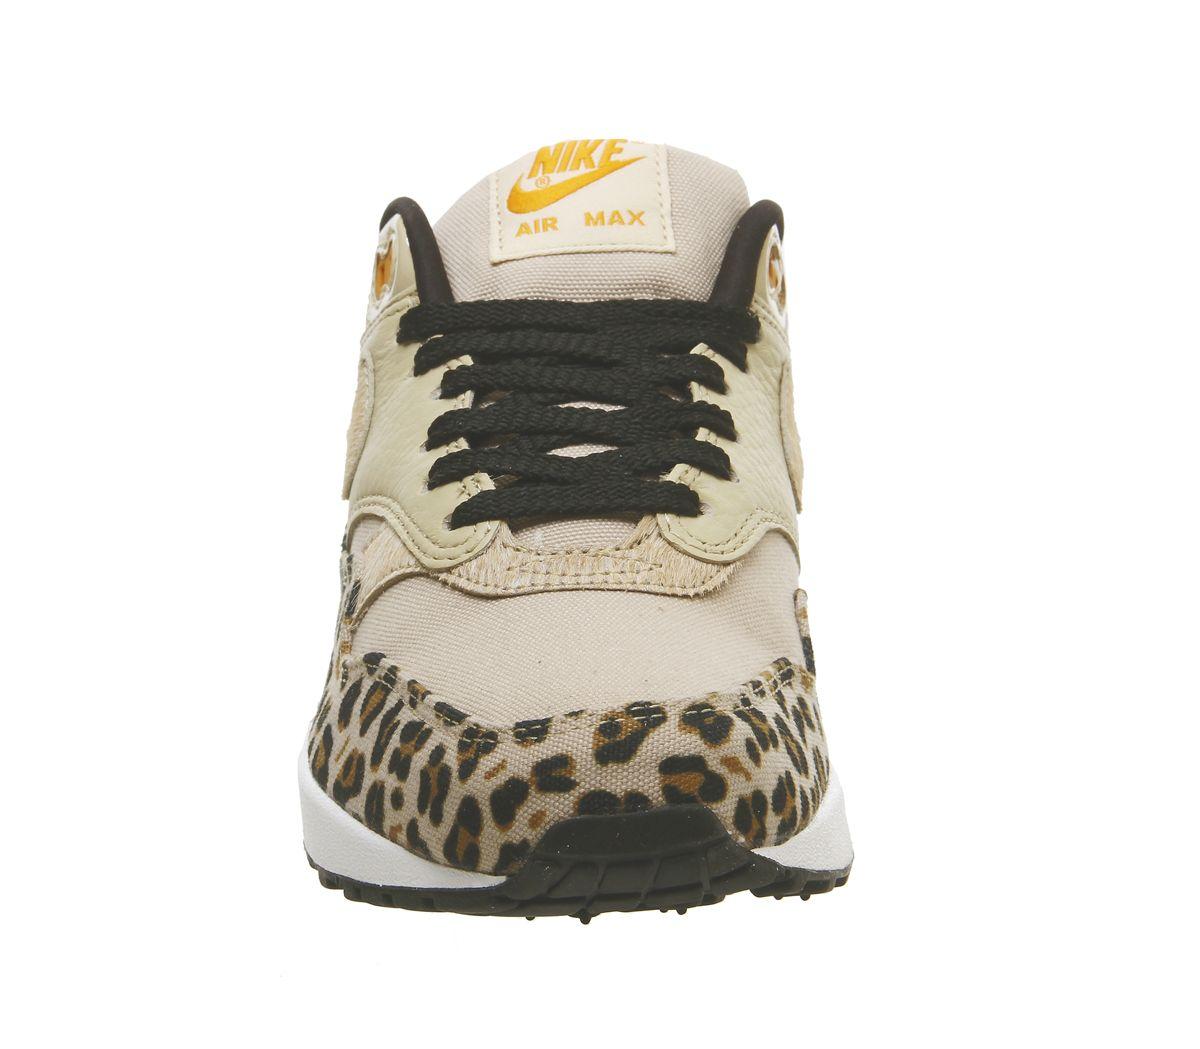 4e4f91caa Nike Air Max 1 Trainers Desert Ore Wheat Leopard - Unisex Sports